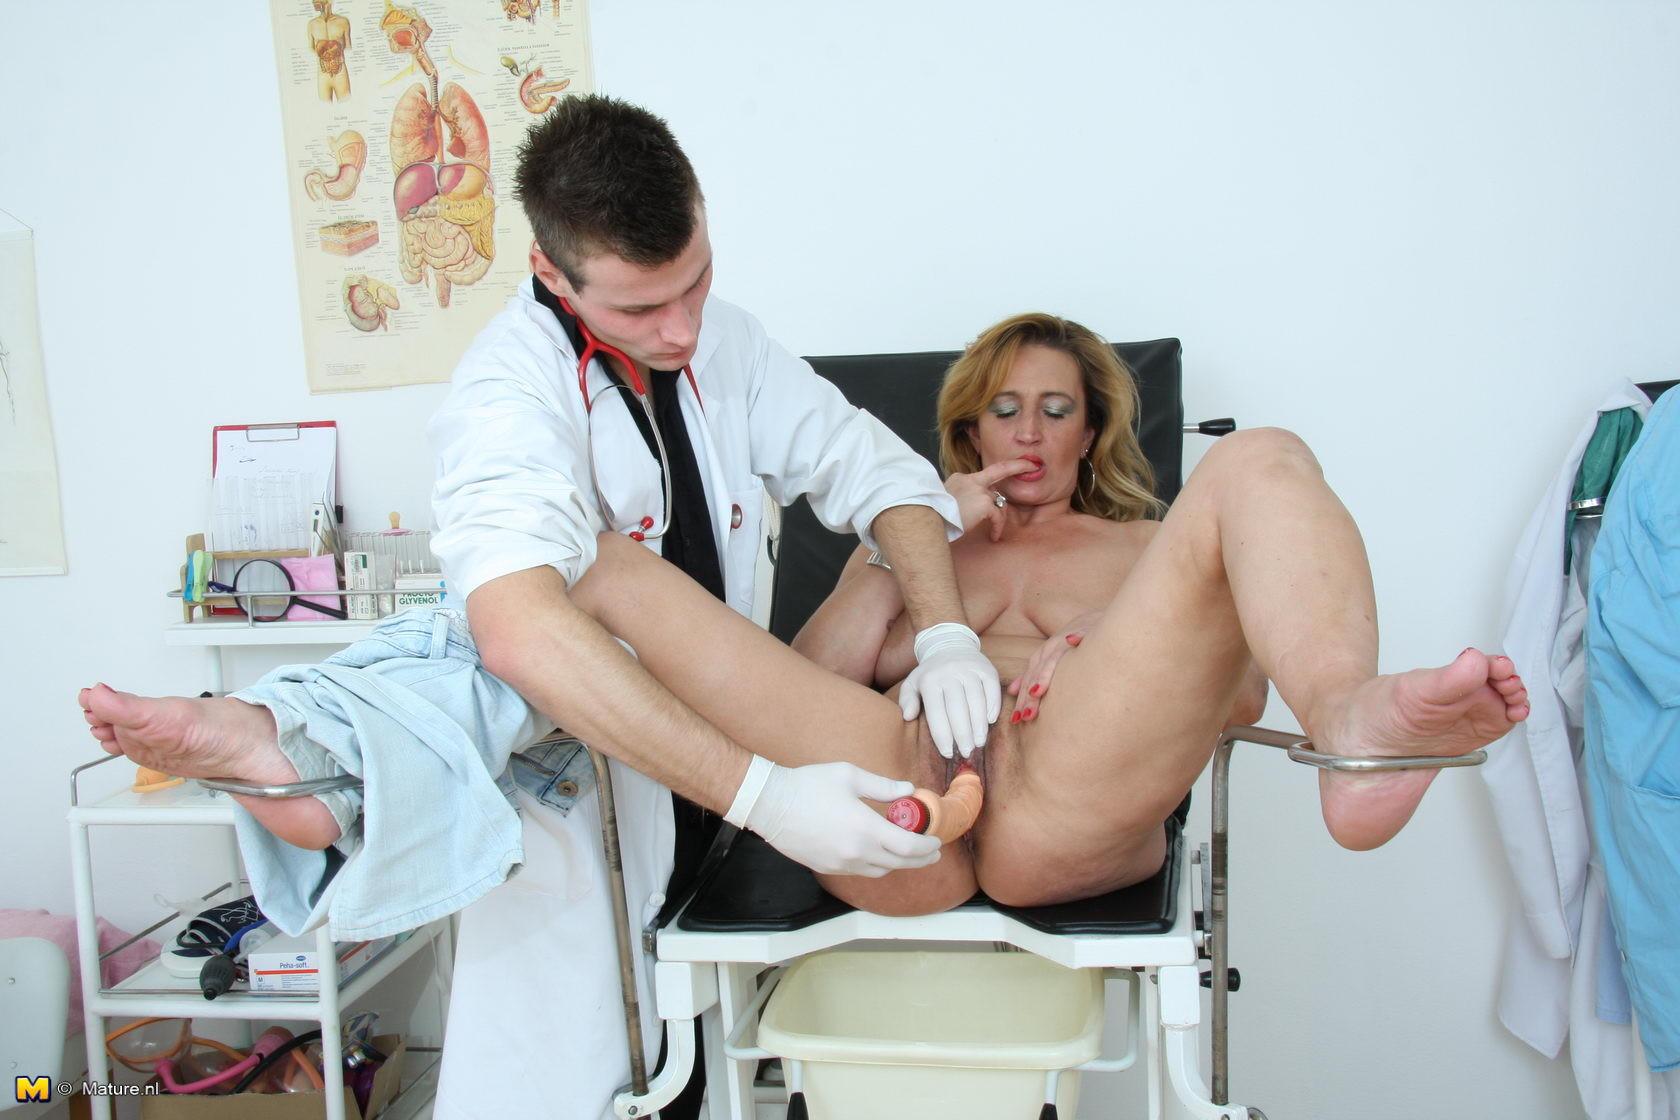 Русское порно видео у врача уролога на приеме